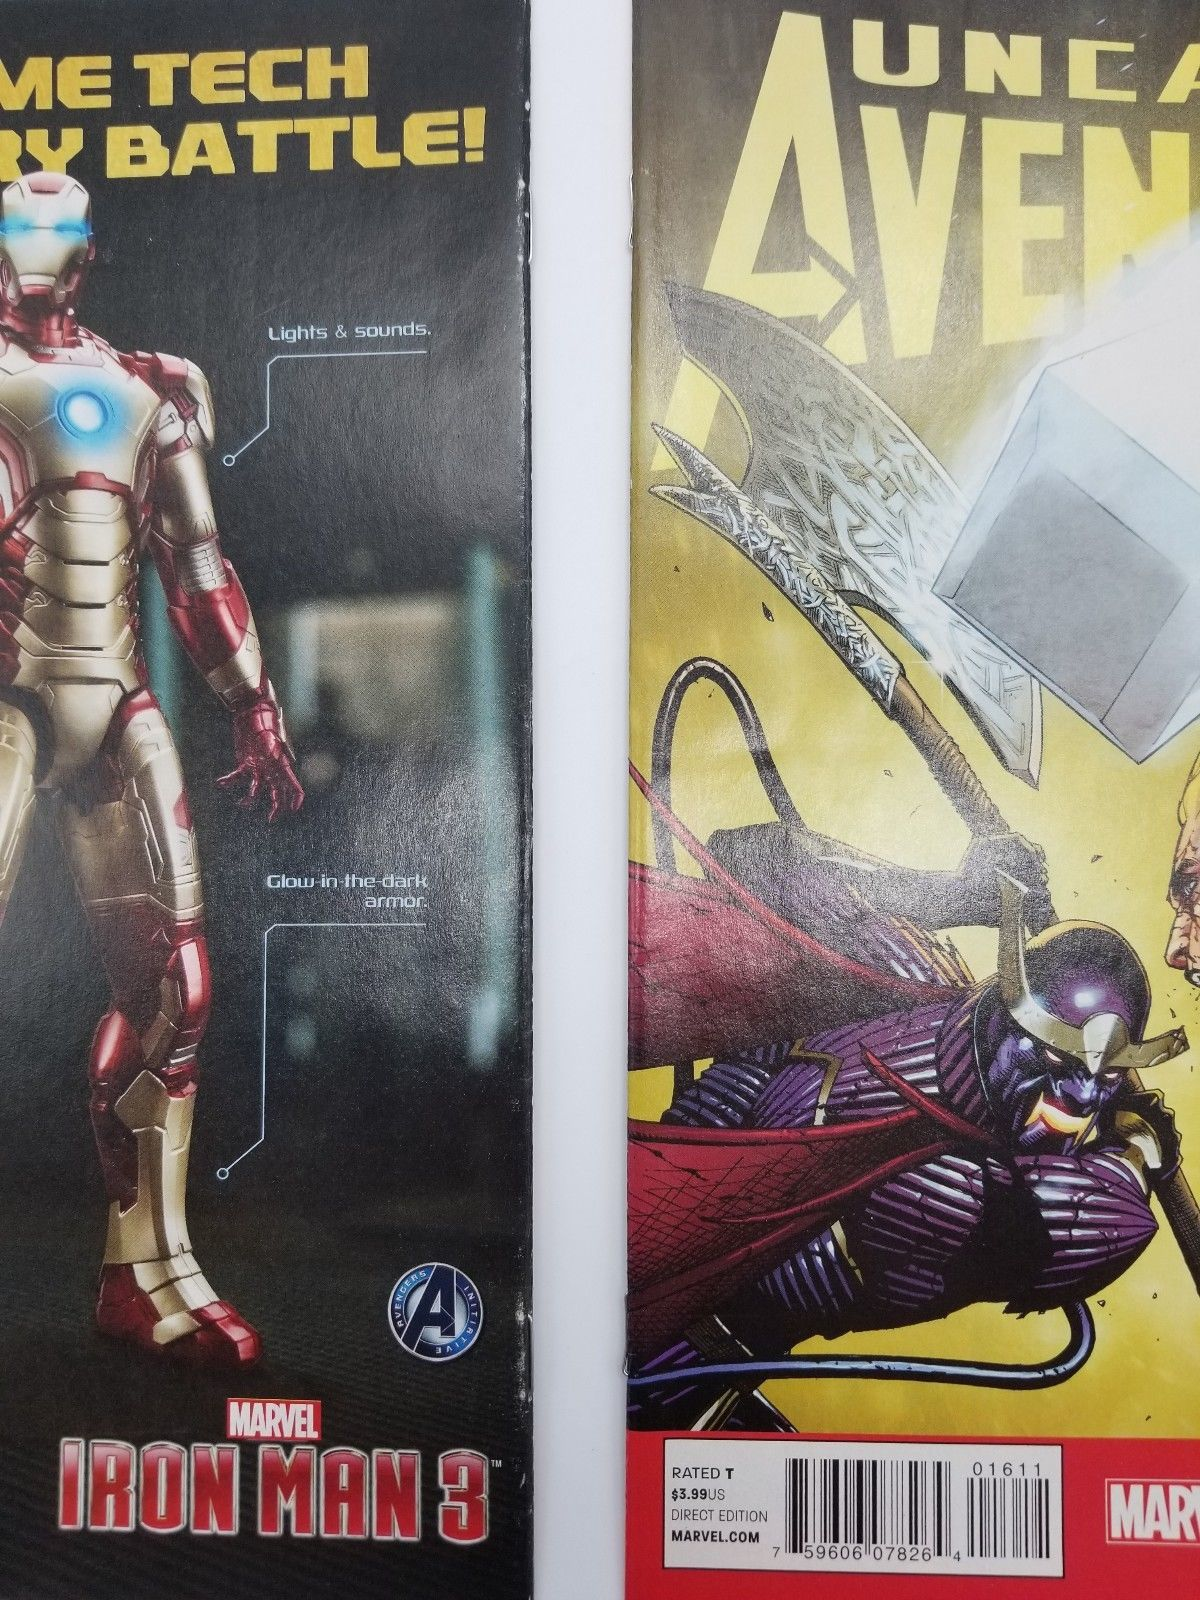 Uncanny Avengers 1-11 14-16 w/ Skottie Young Baby Variant Vol 1 2012 Comic Books image 10